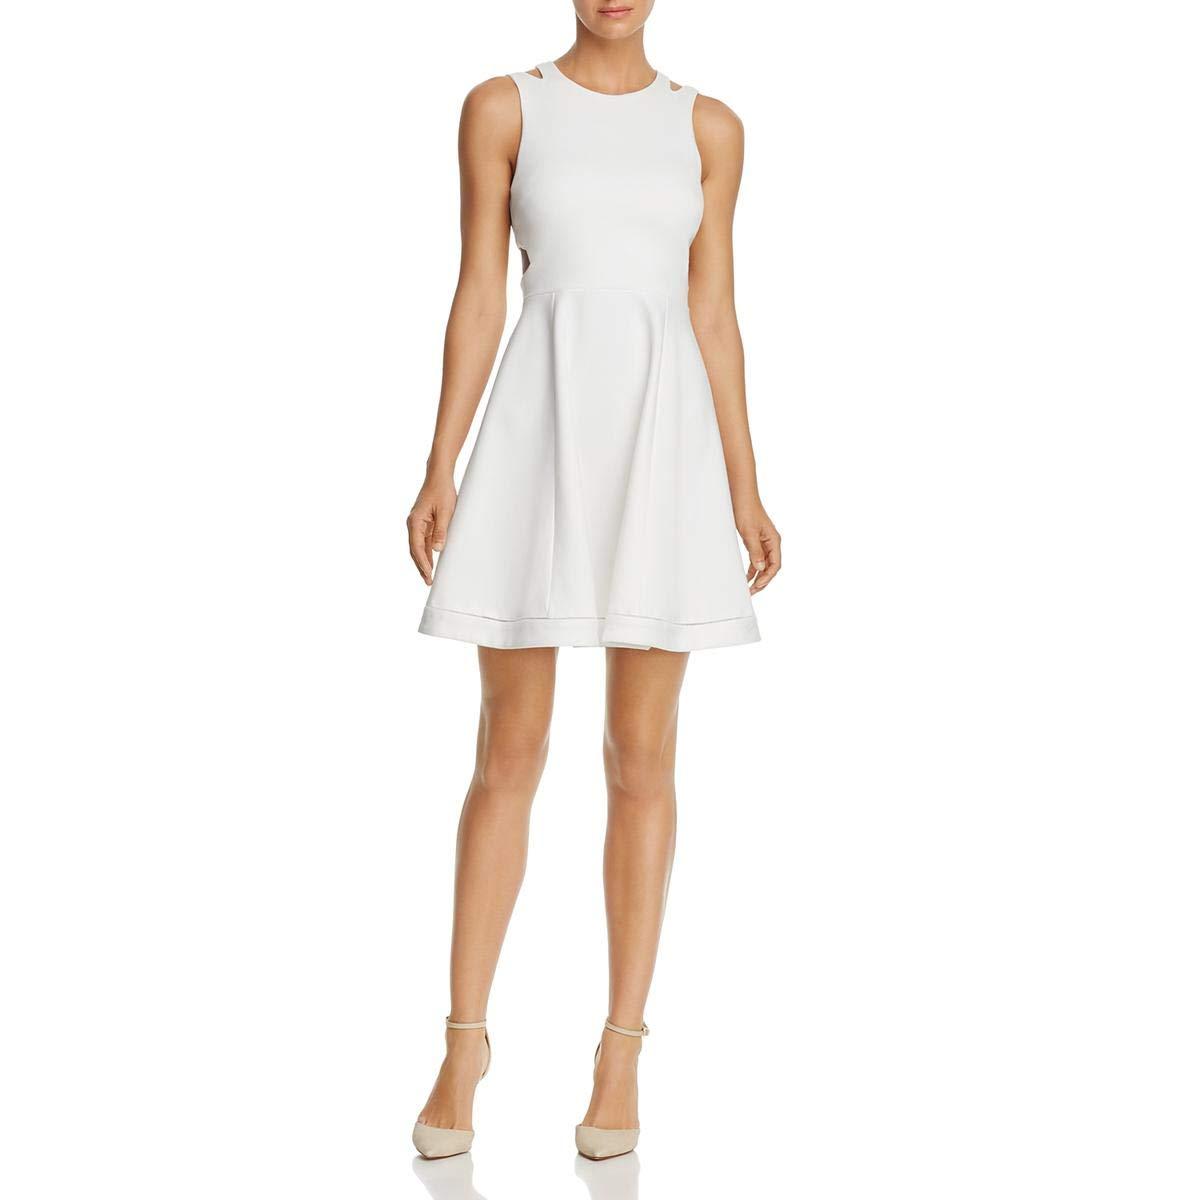 French Connection Women's Whisper Light Sleeveless Strappy Stretch Mini Dress, White Lula, 6